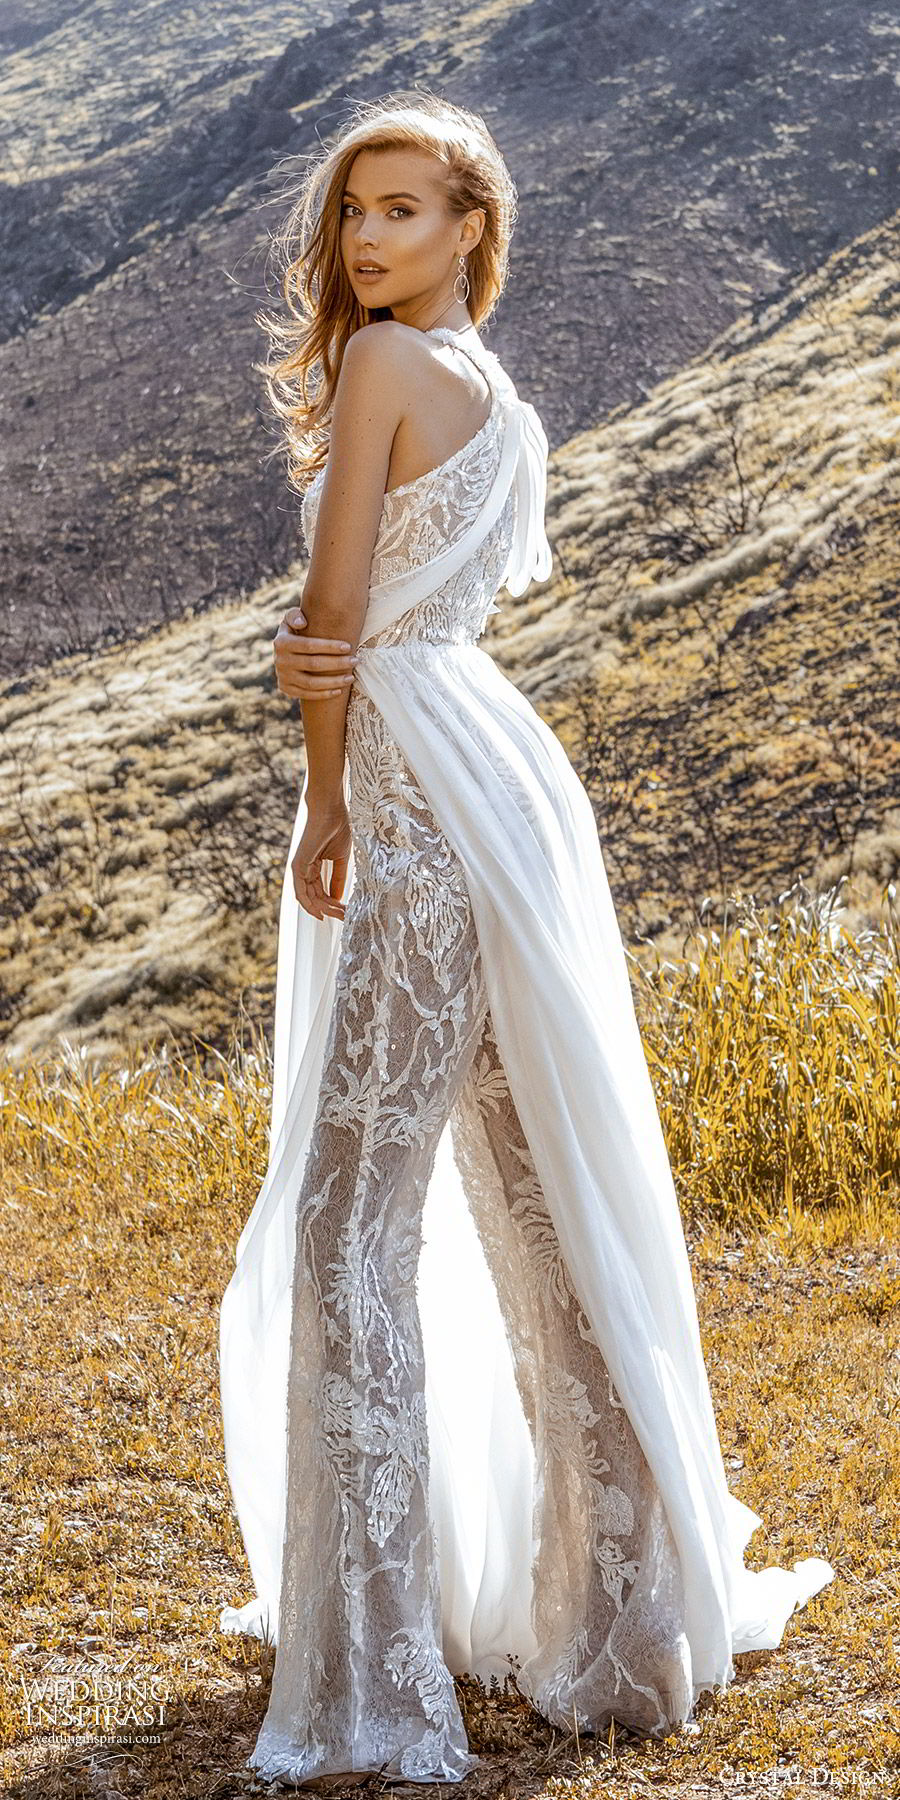 crystal design 2020 couture bridal sleeveless halter neckline jumpsuit wedding dress a line skirt slit (5) modern chic romantic bv